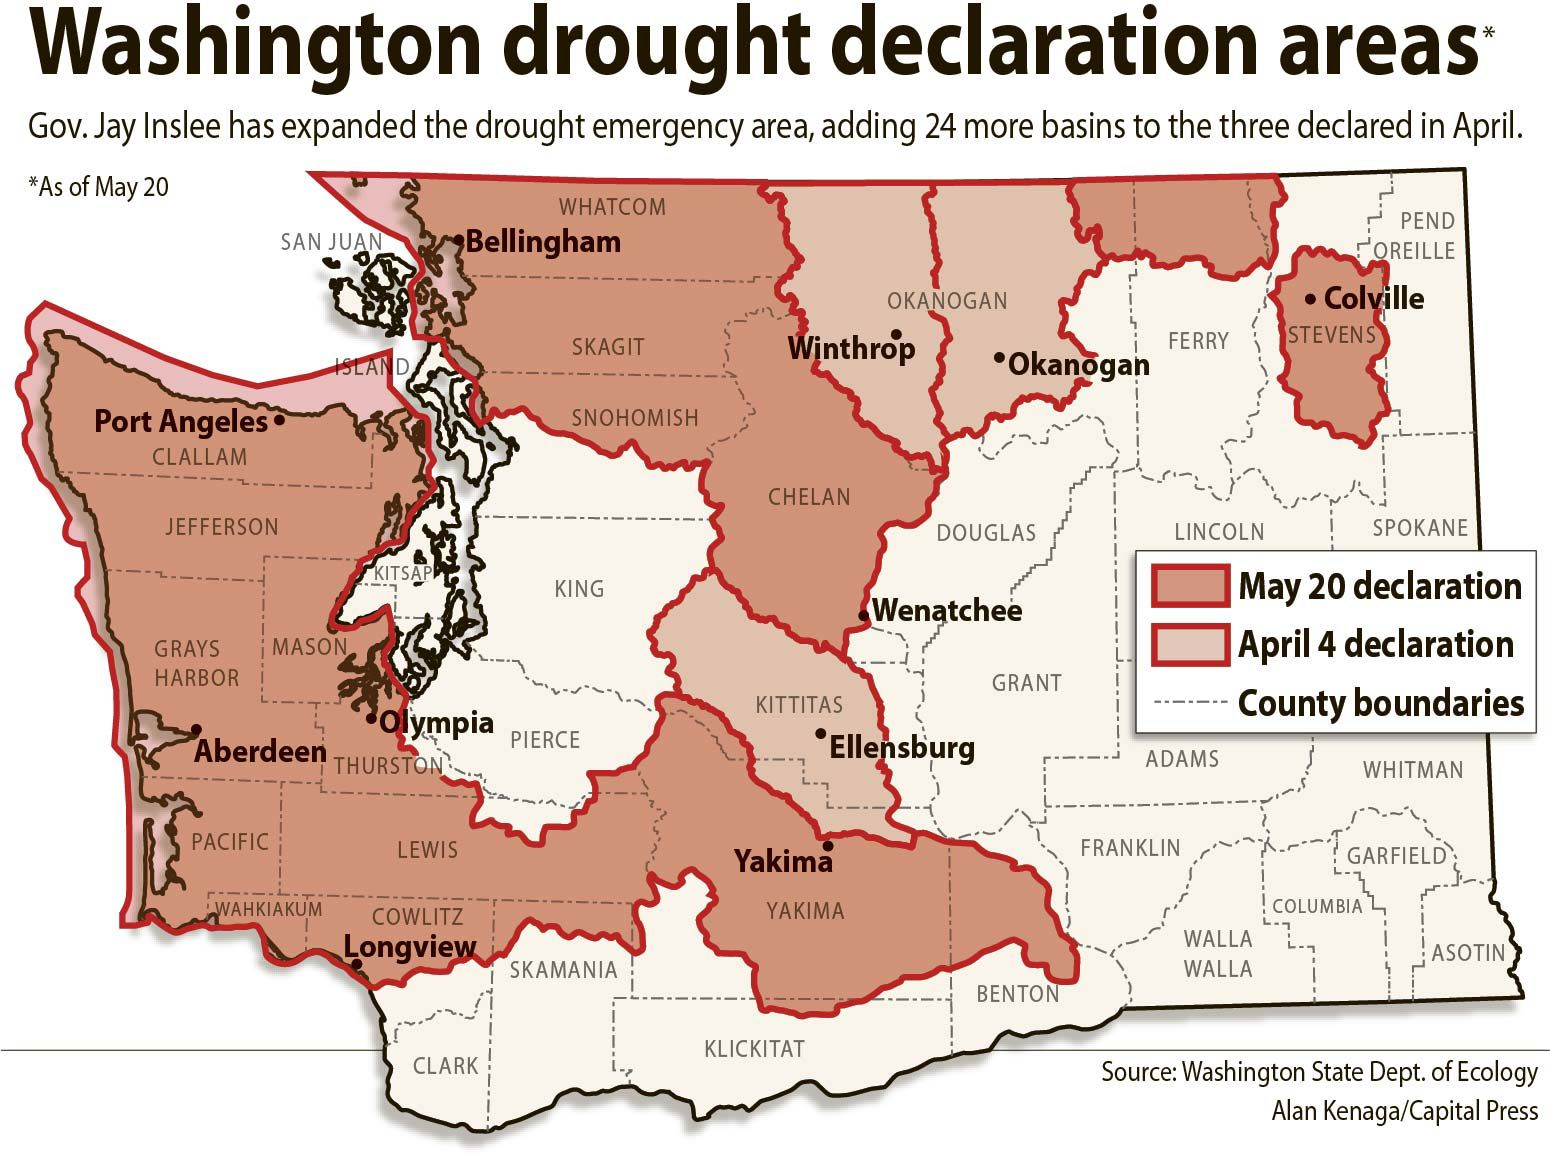 Wash. drought emergency declaration